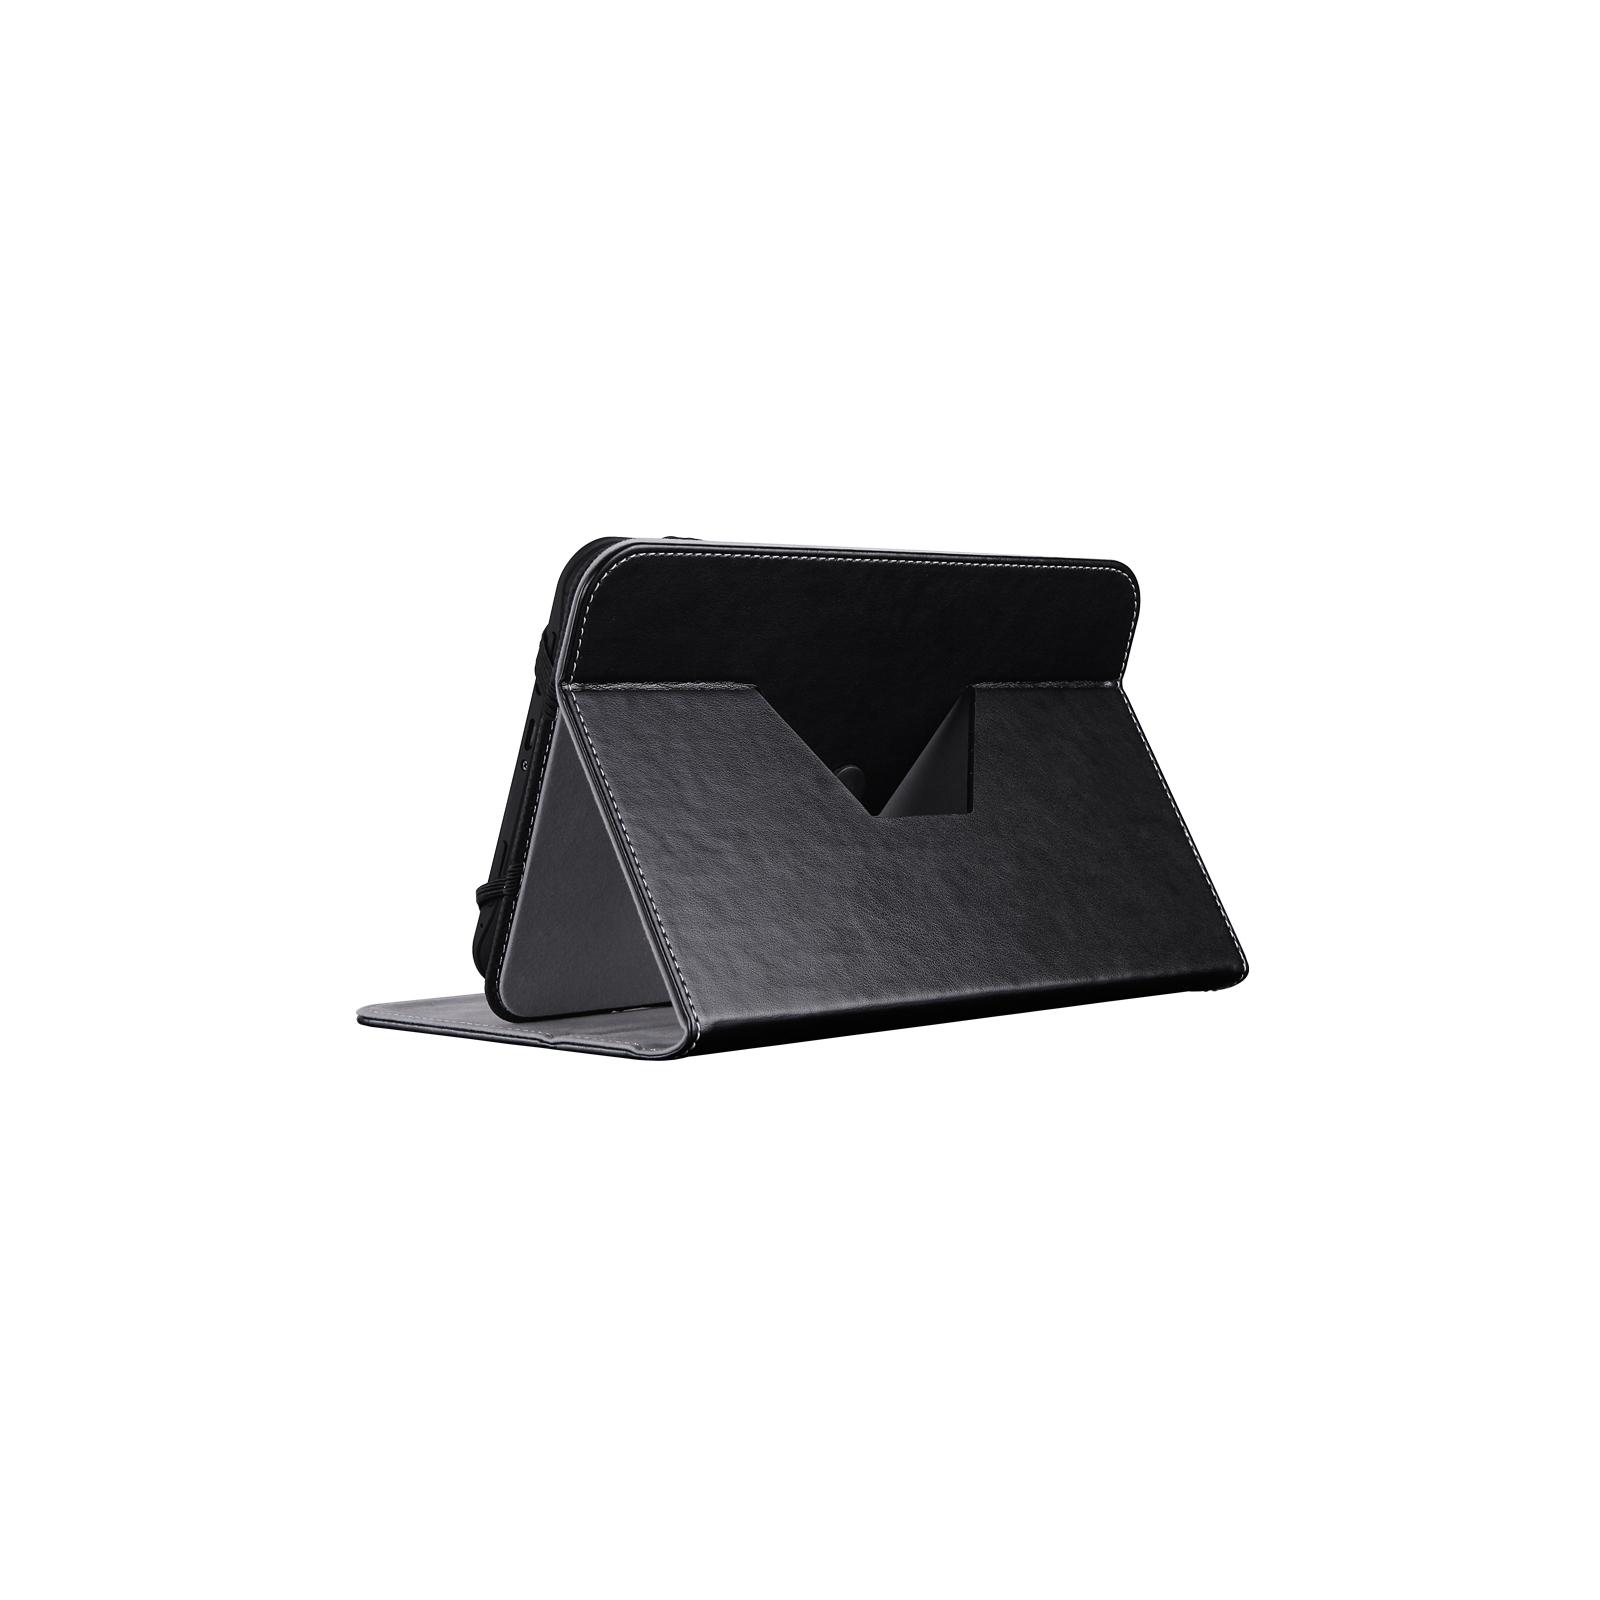 "Чехол для планшета PRESTIGIO 7"" Universal rotating BLACK (PTCL0207BK) изображение 6"